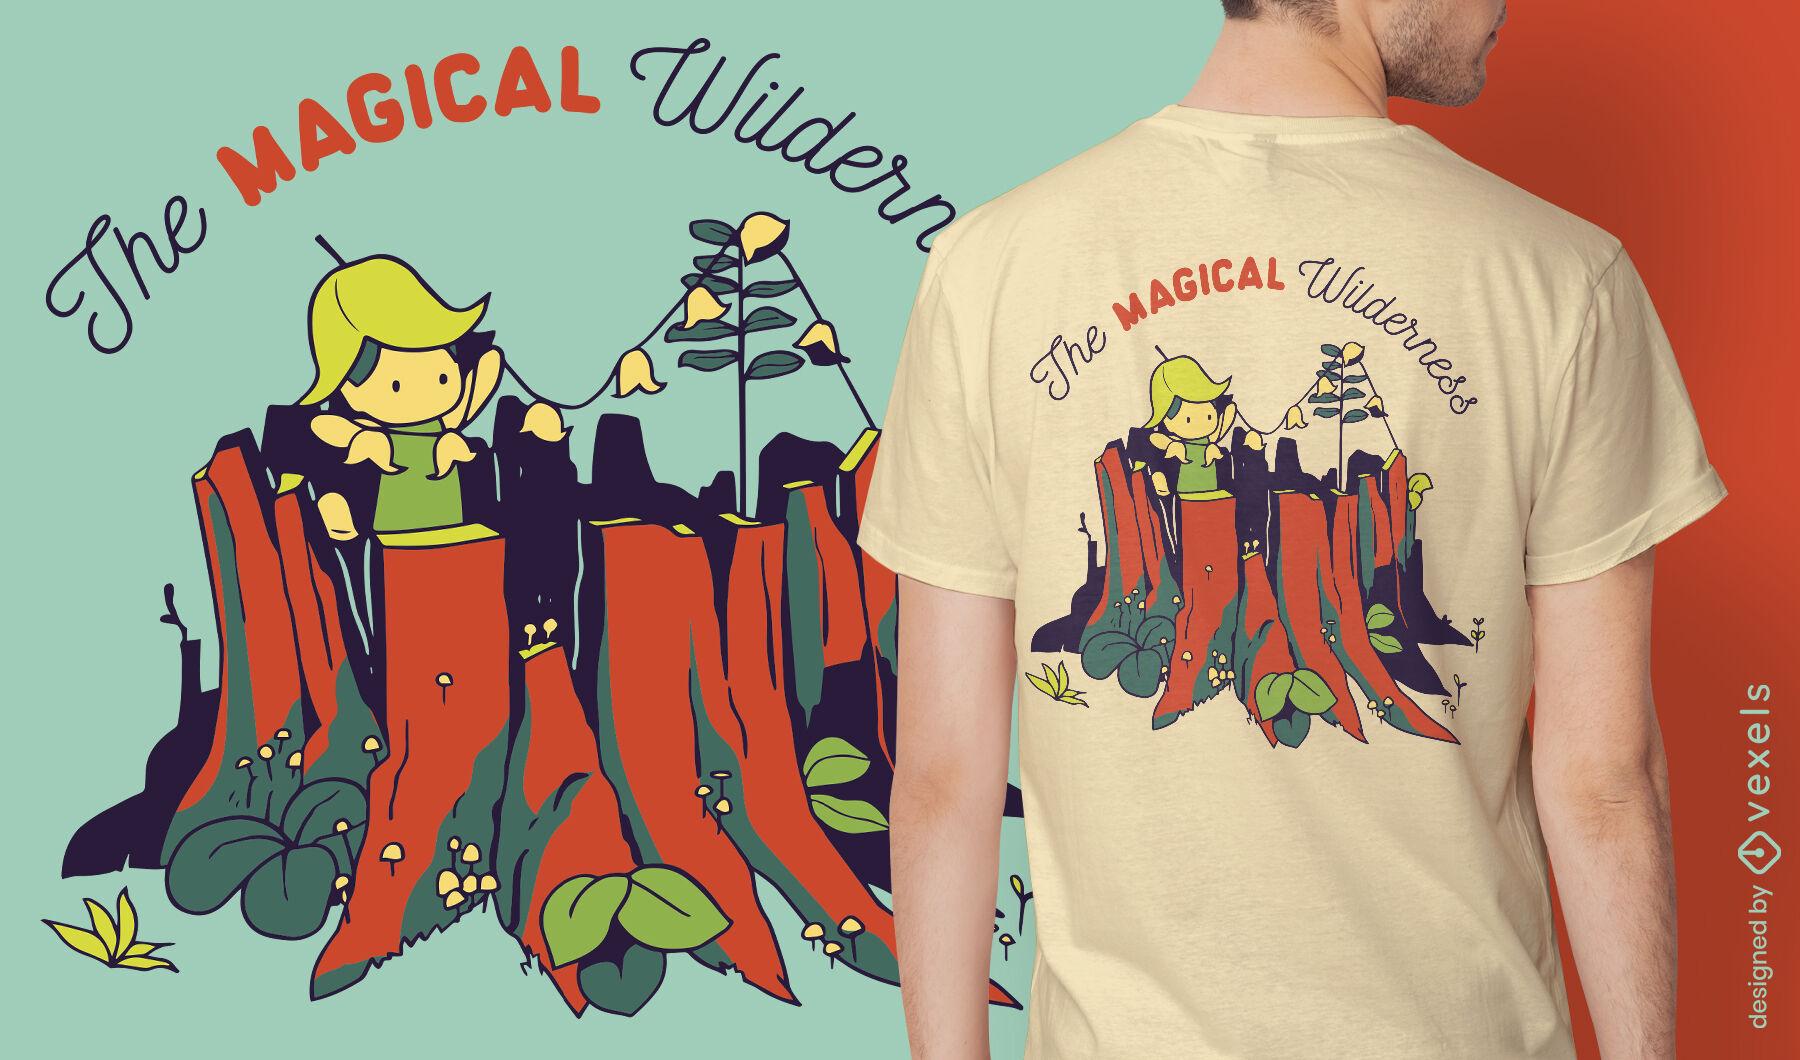 Magical wilderness tiny girl t-shirt design